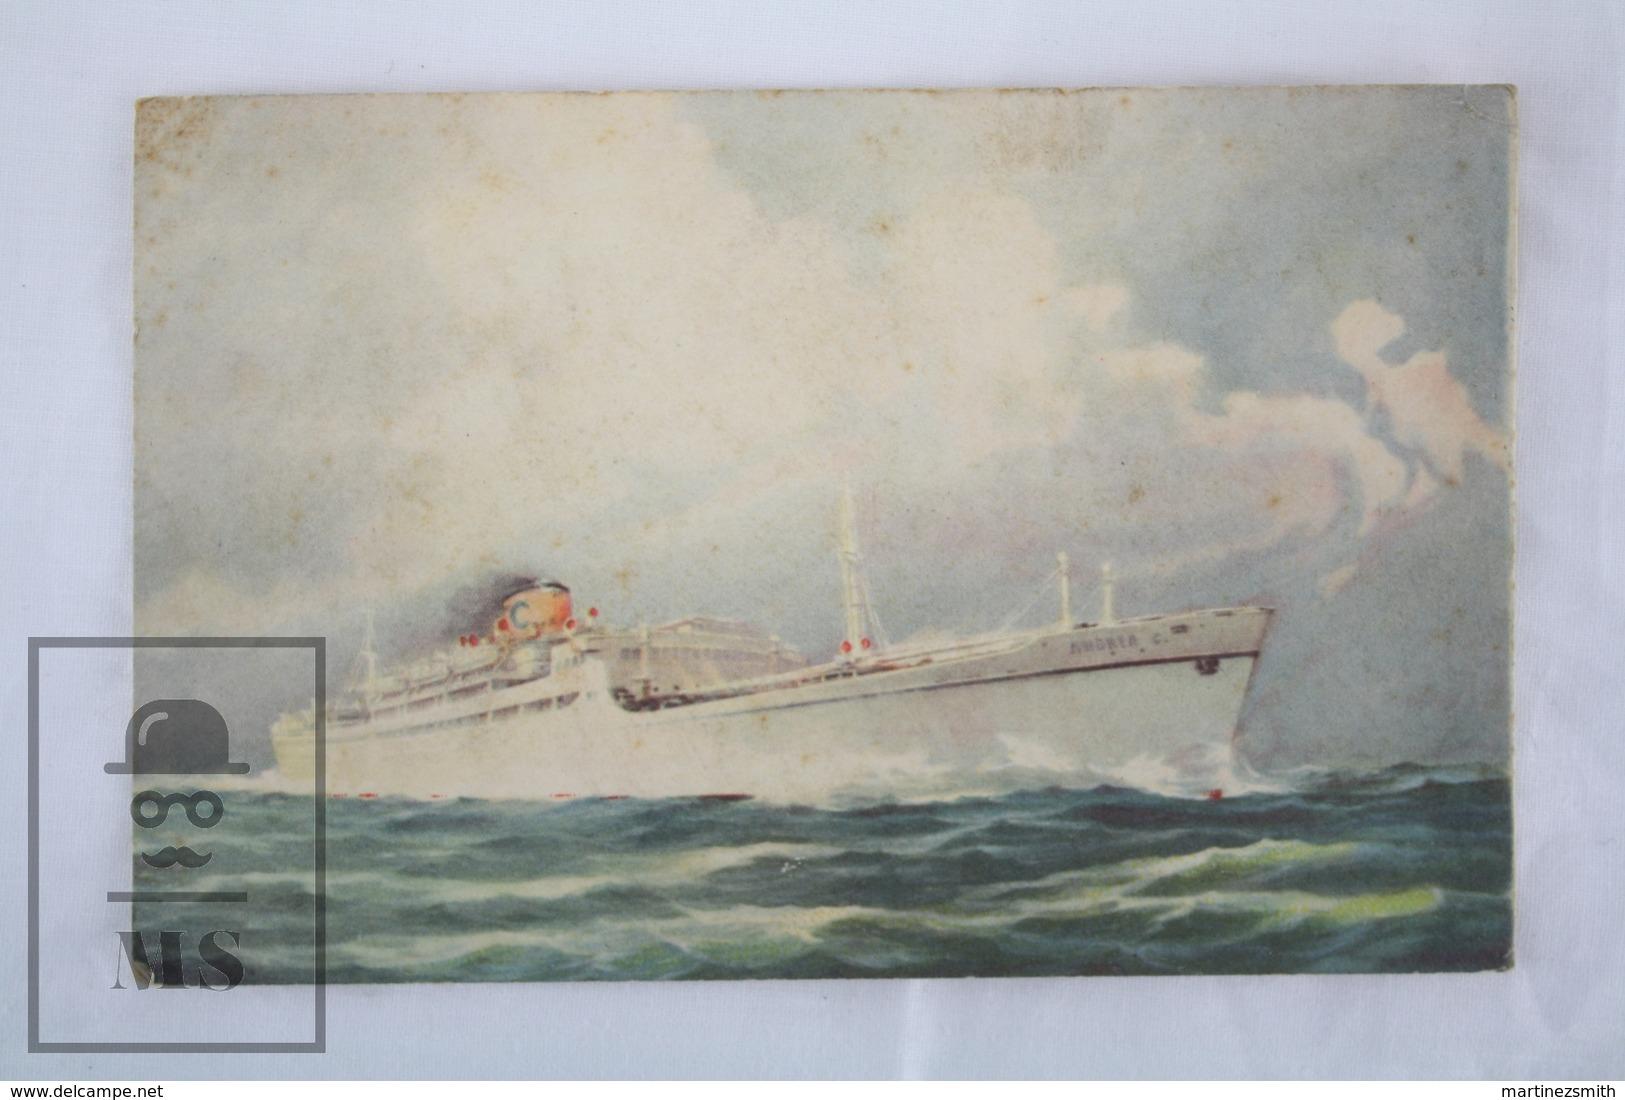 Boat/ Ship Illustrated Topic Postcard - Andrea C. Cruise Ship - Bateaux